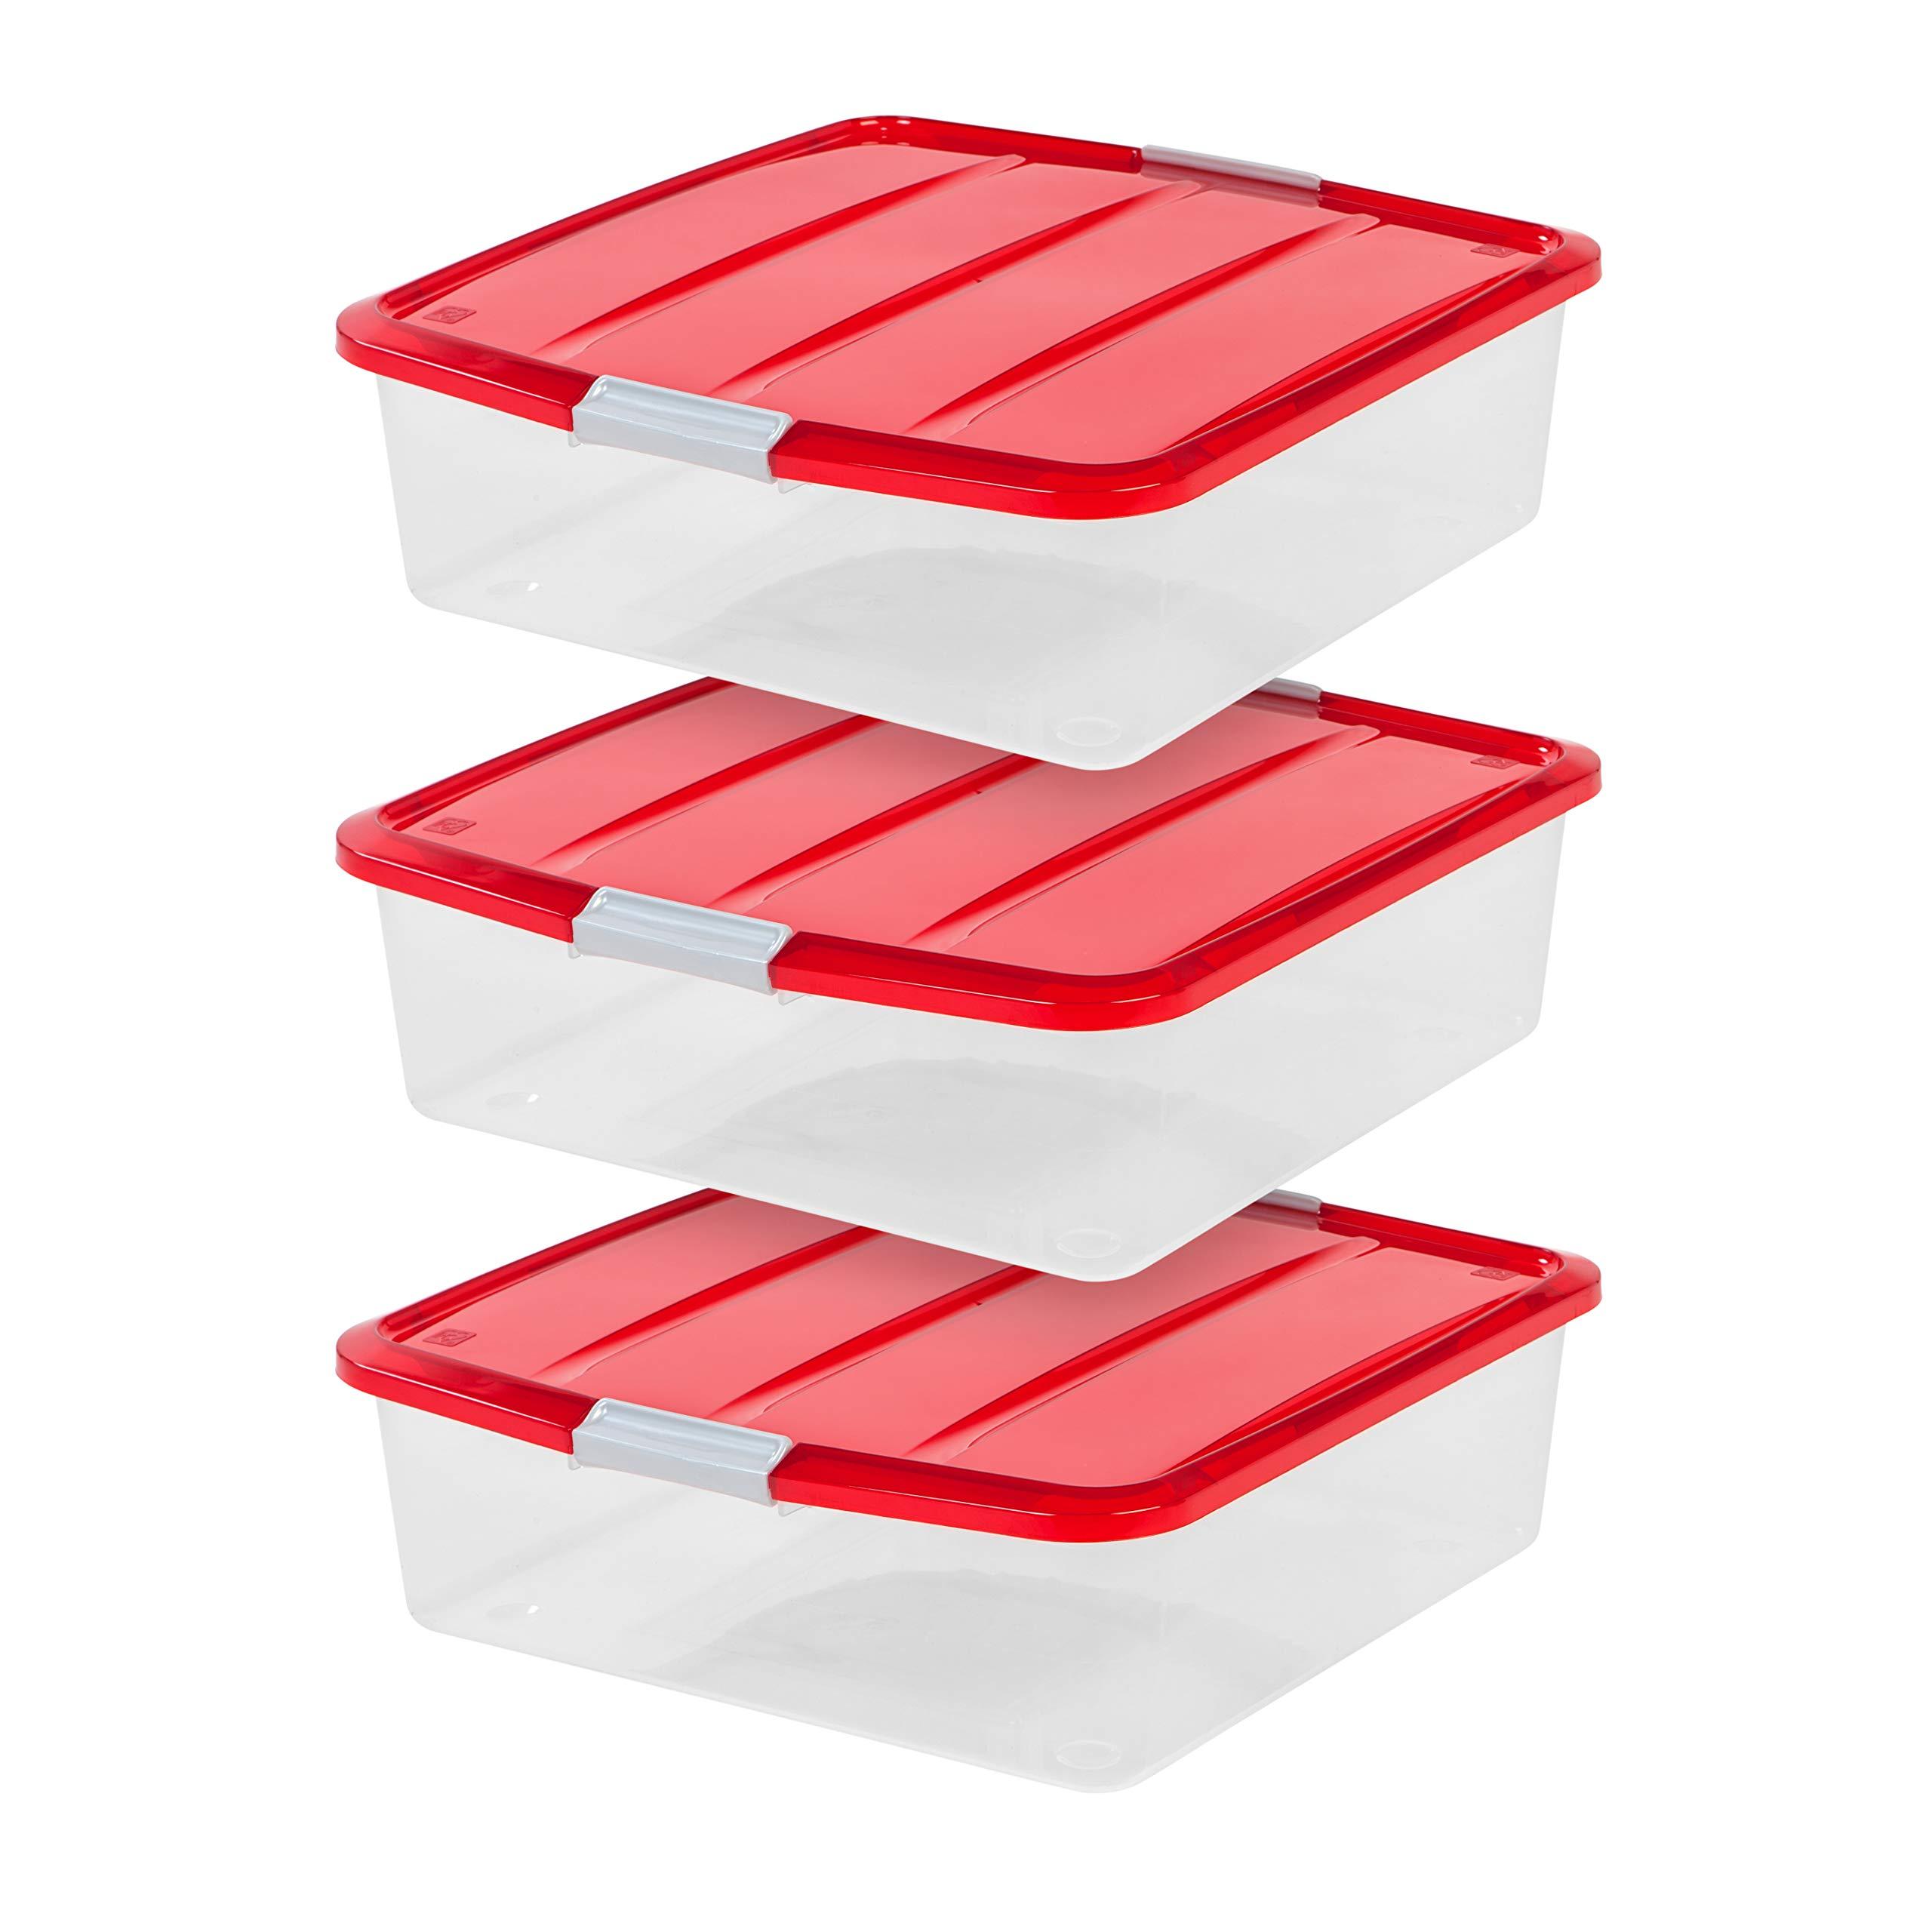 IRIS USA BCB-SQ Wreath Storage Box, 3 Pack, Red by IRIS USA, Inc.